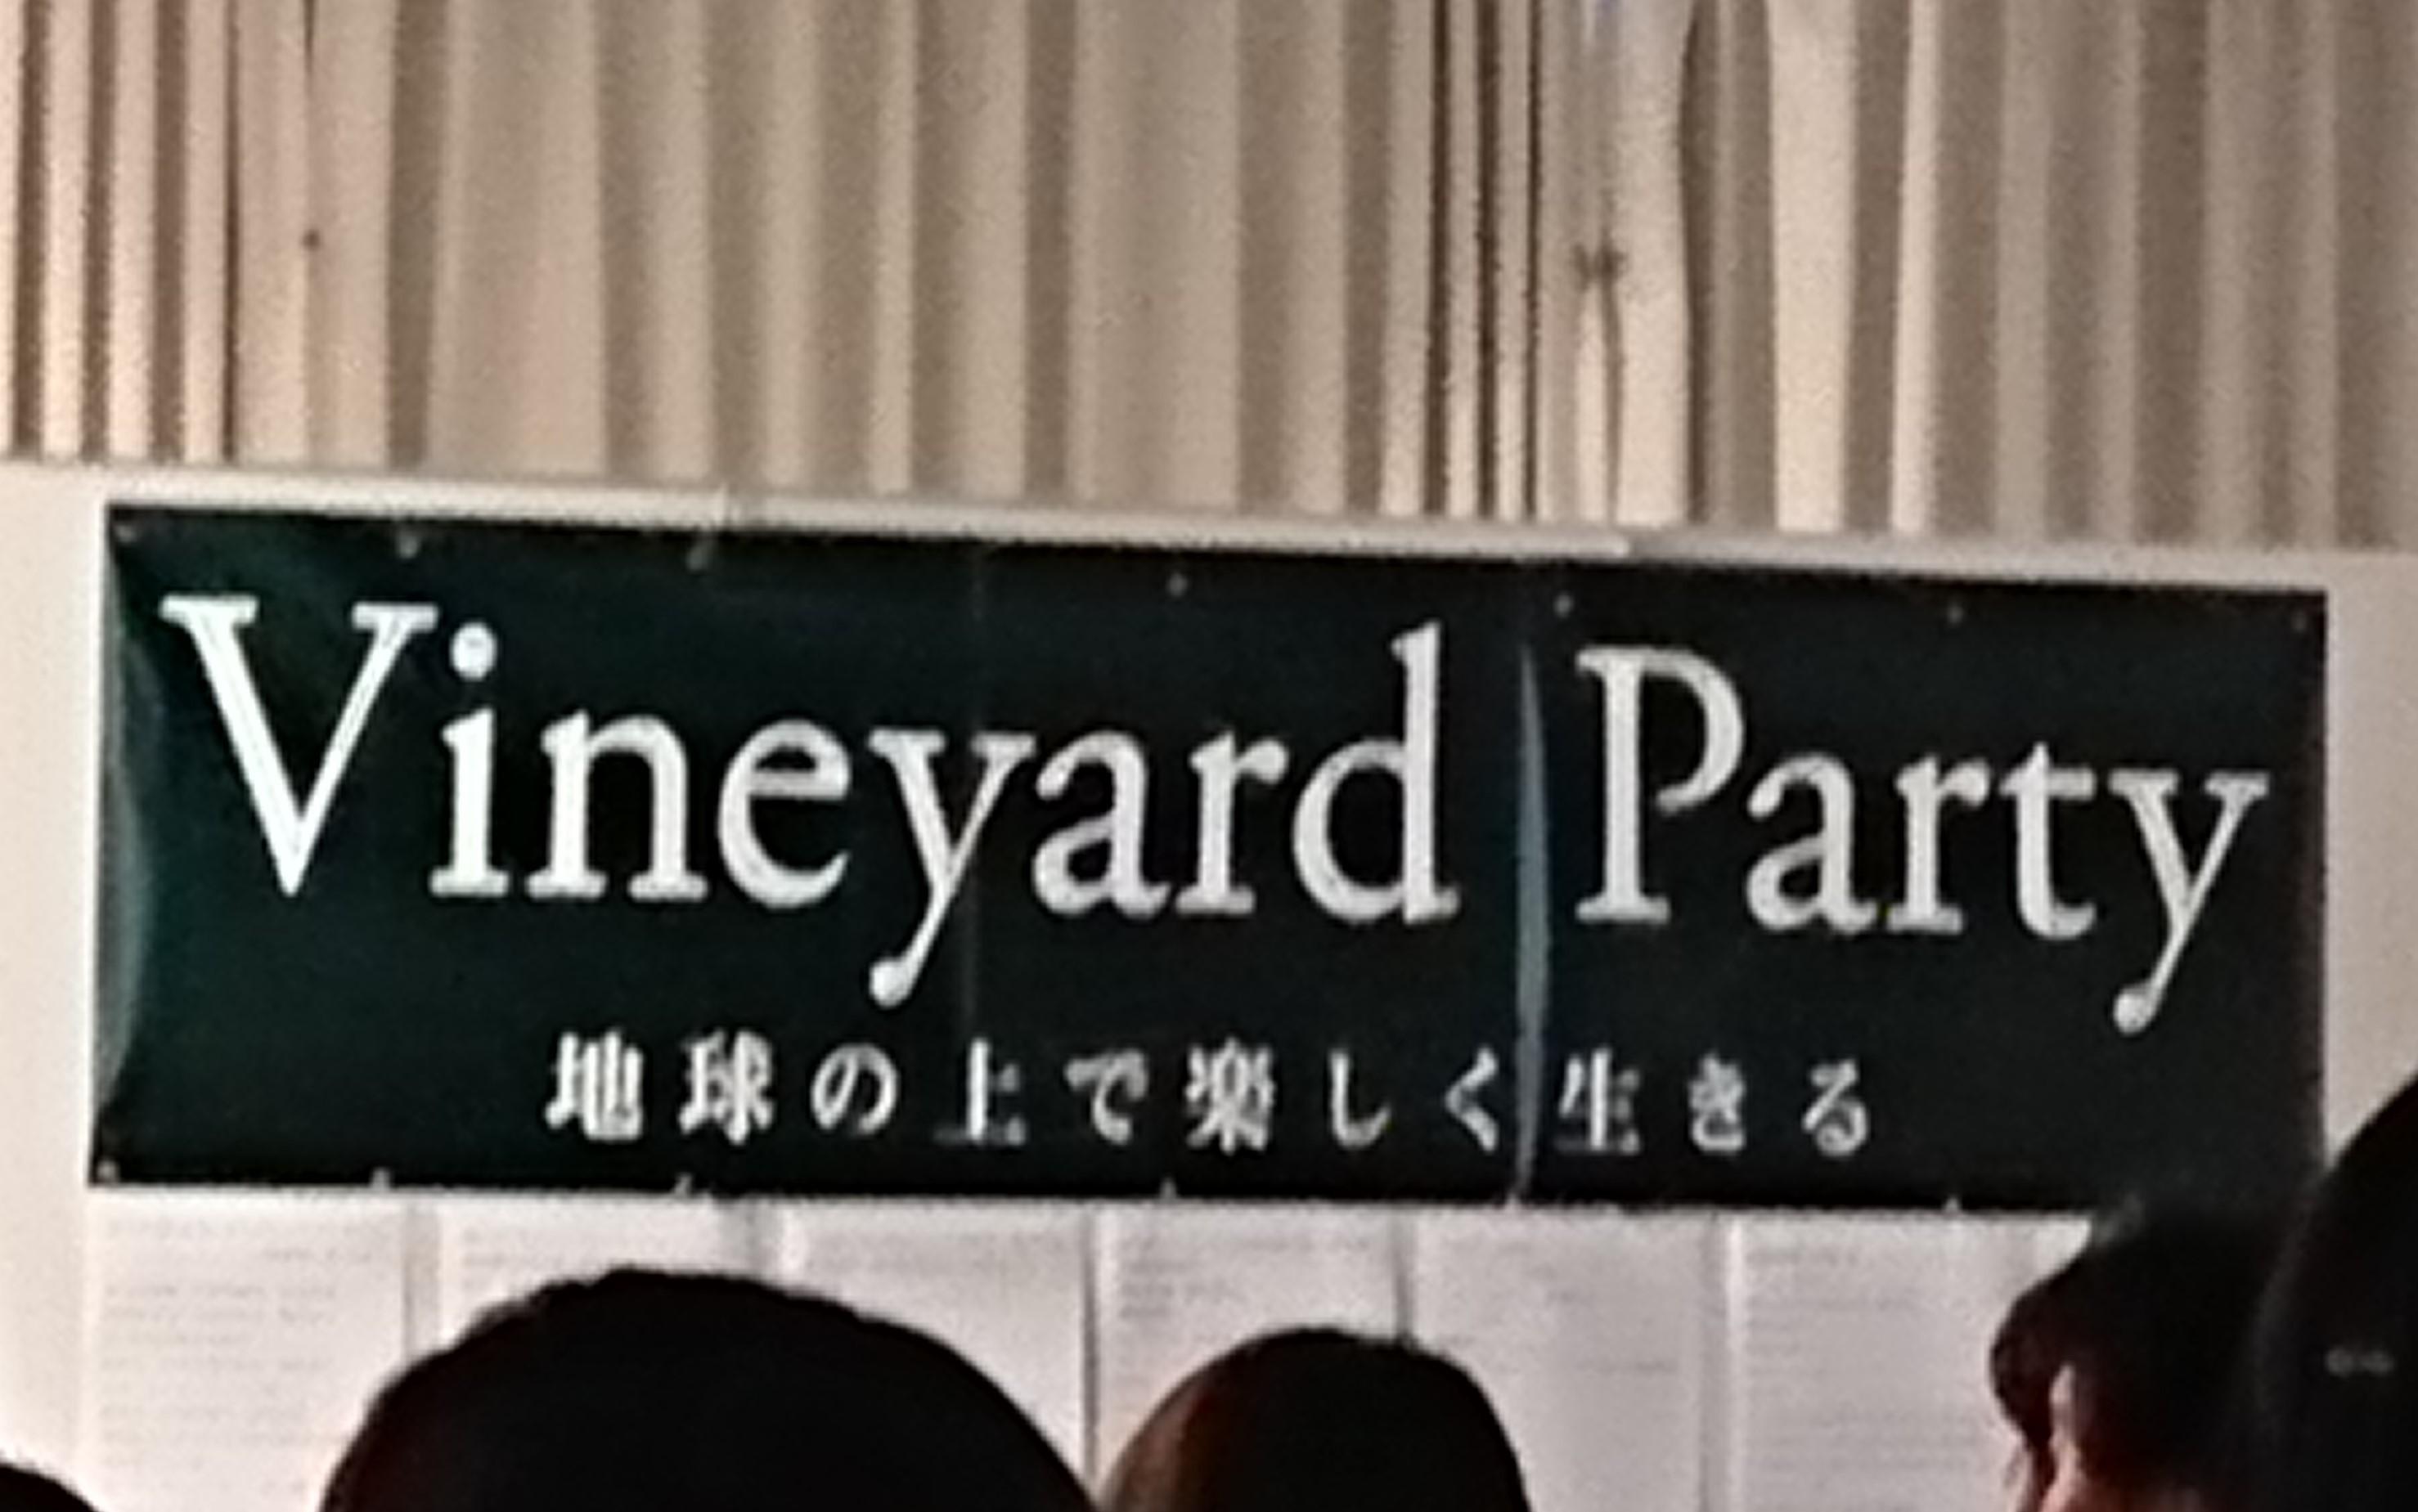 Vineyard Party 地球の上で楽しく生きる@ココファームワイナリー_c0100865_11423649.jpg